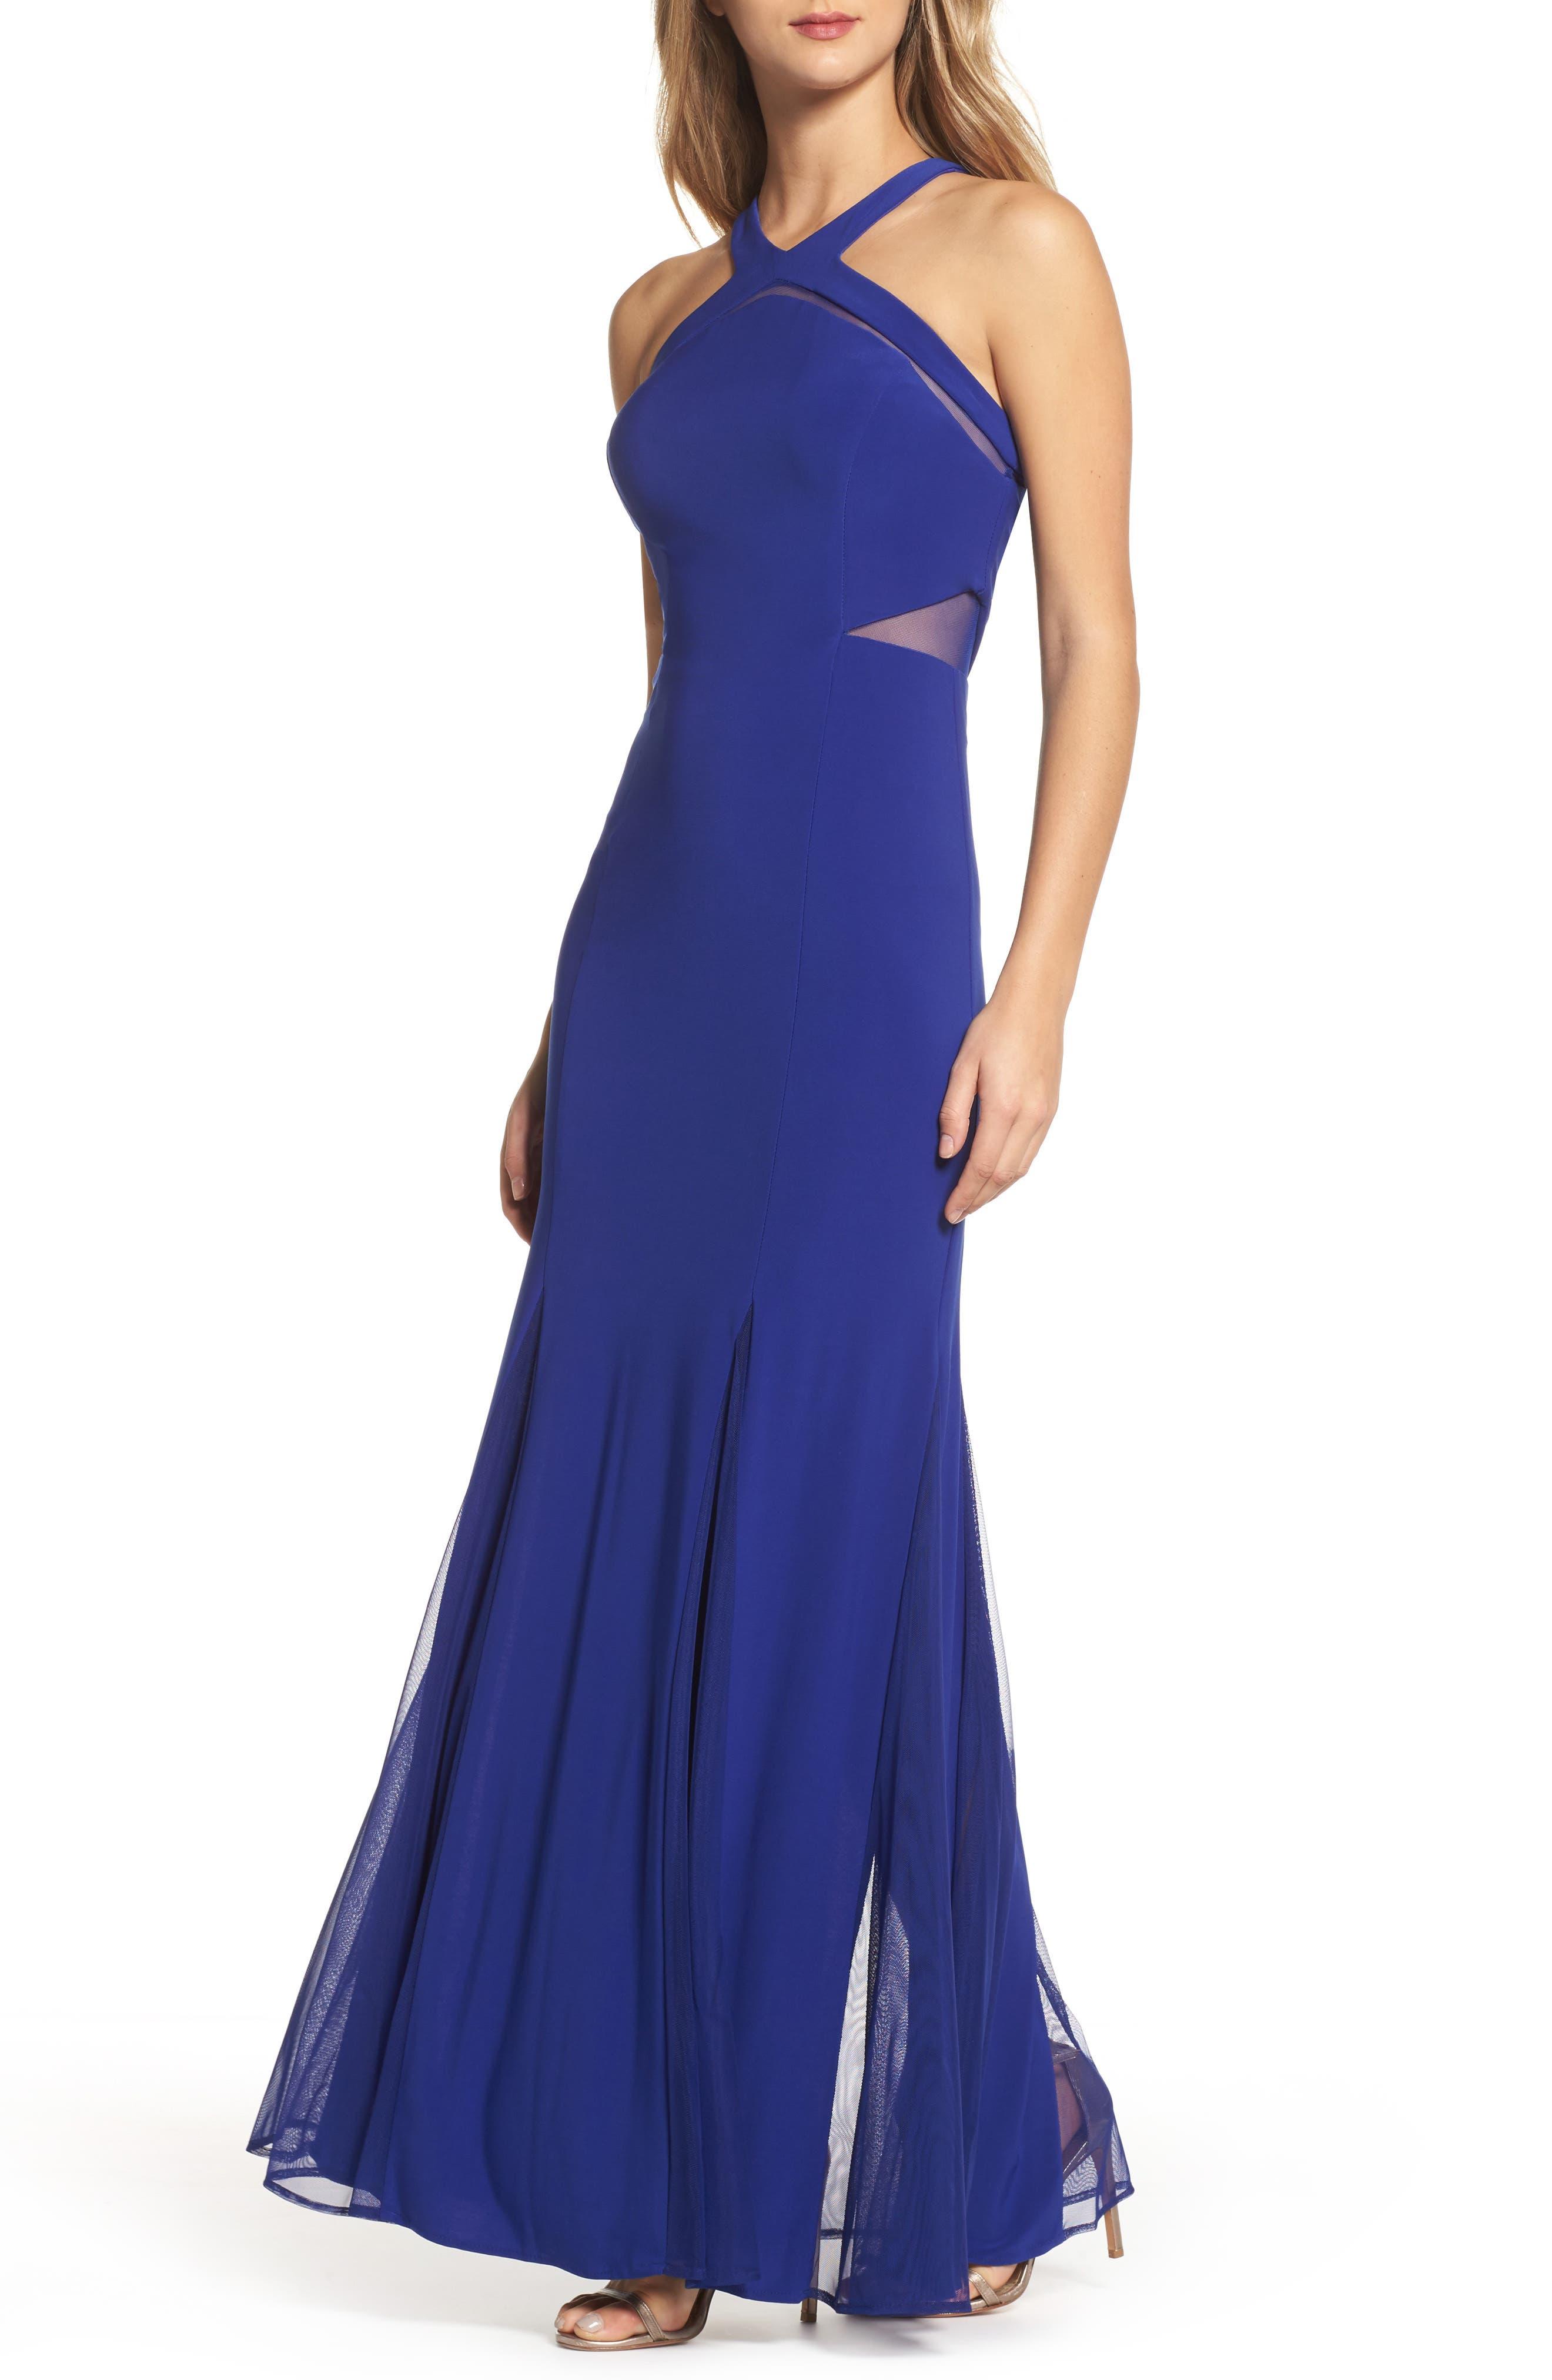 Alternate Image 1 Selected - Morgan & Co. Mesh Inset Knit Mermaid Gown